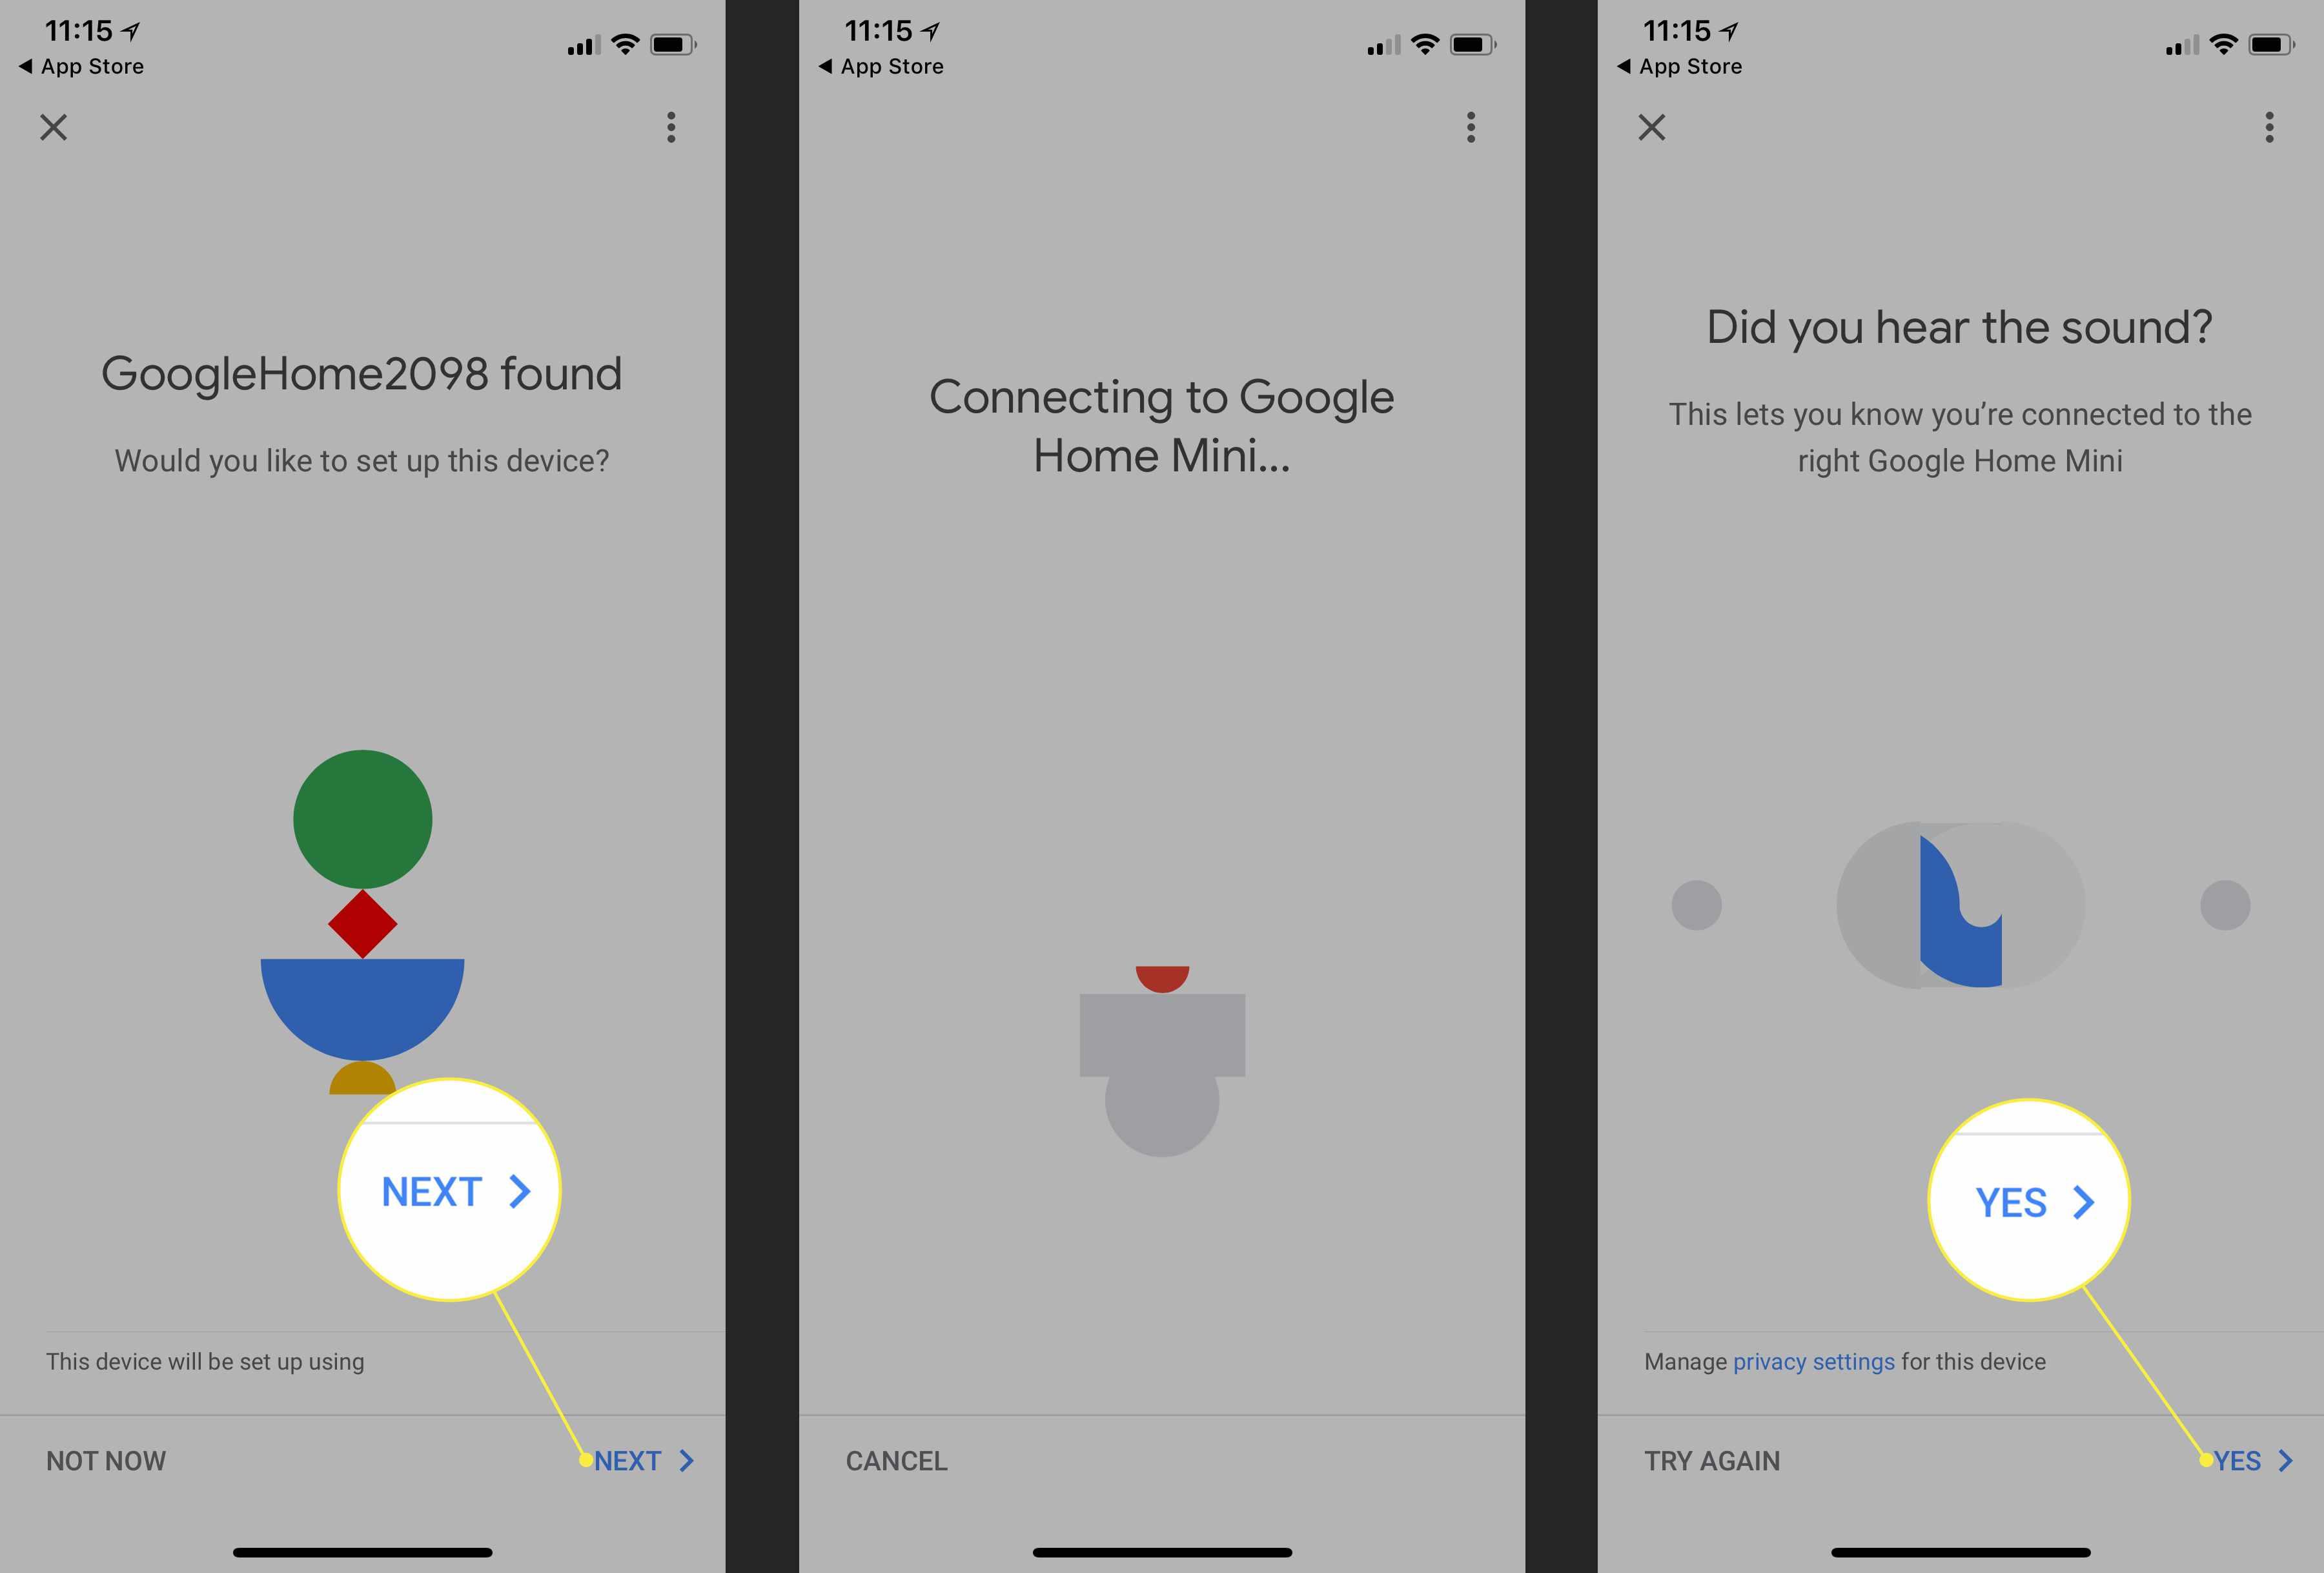 The speaker test in Google Home